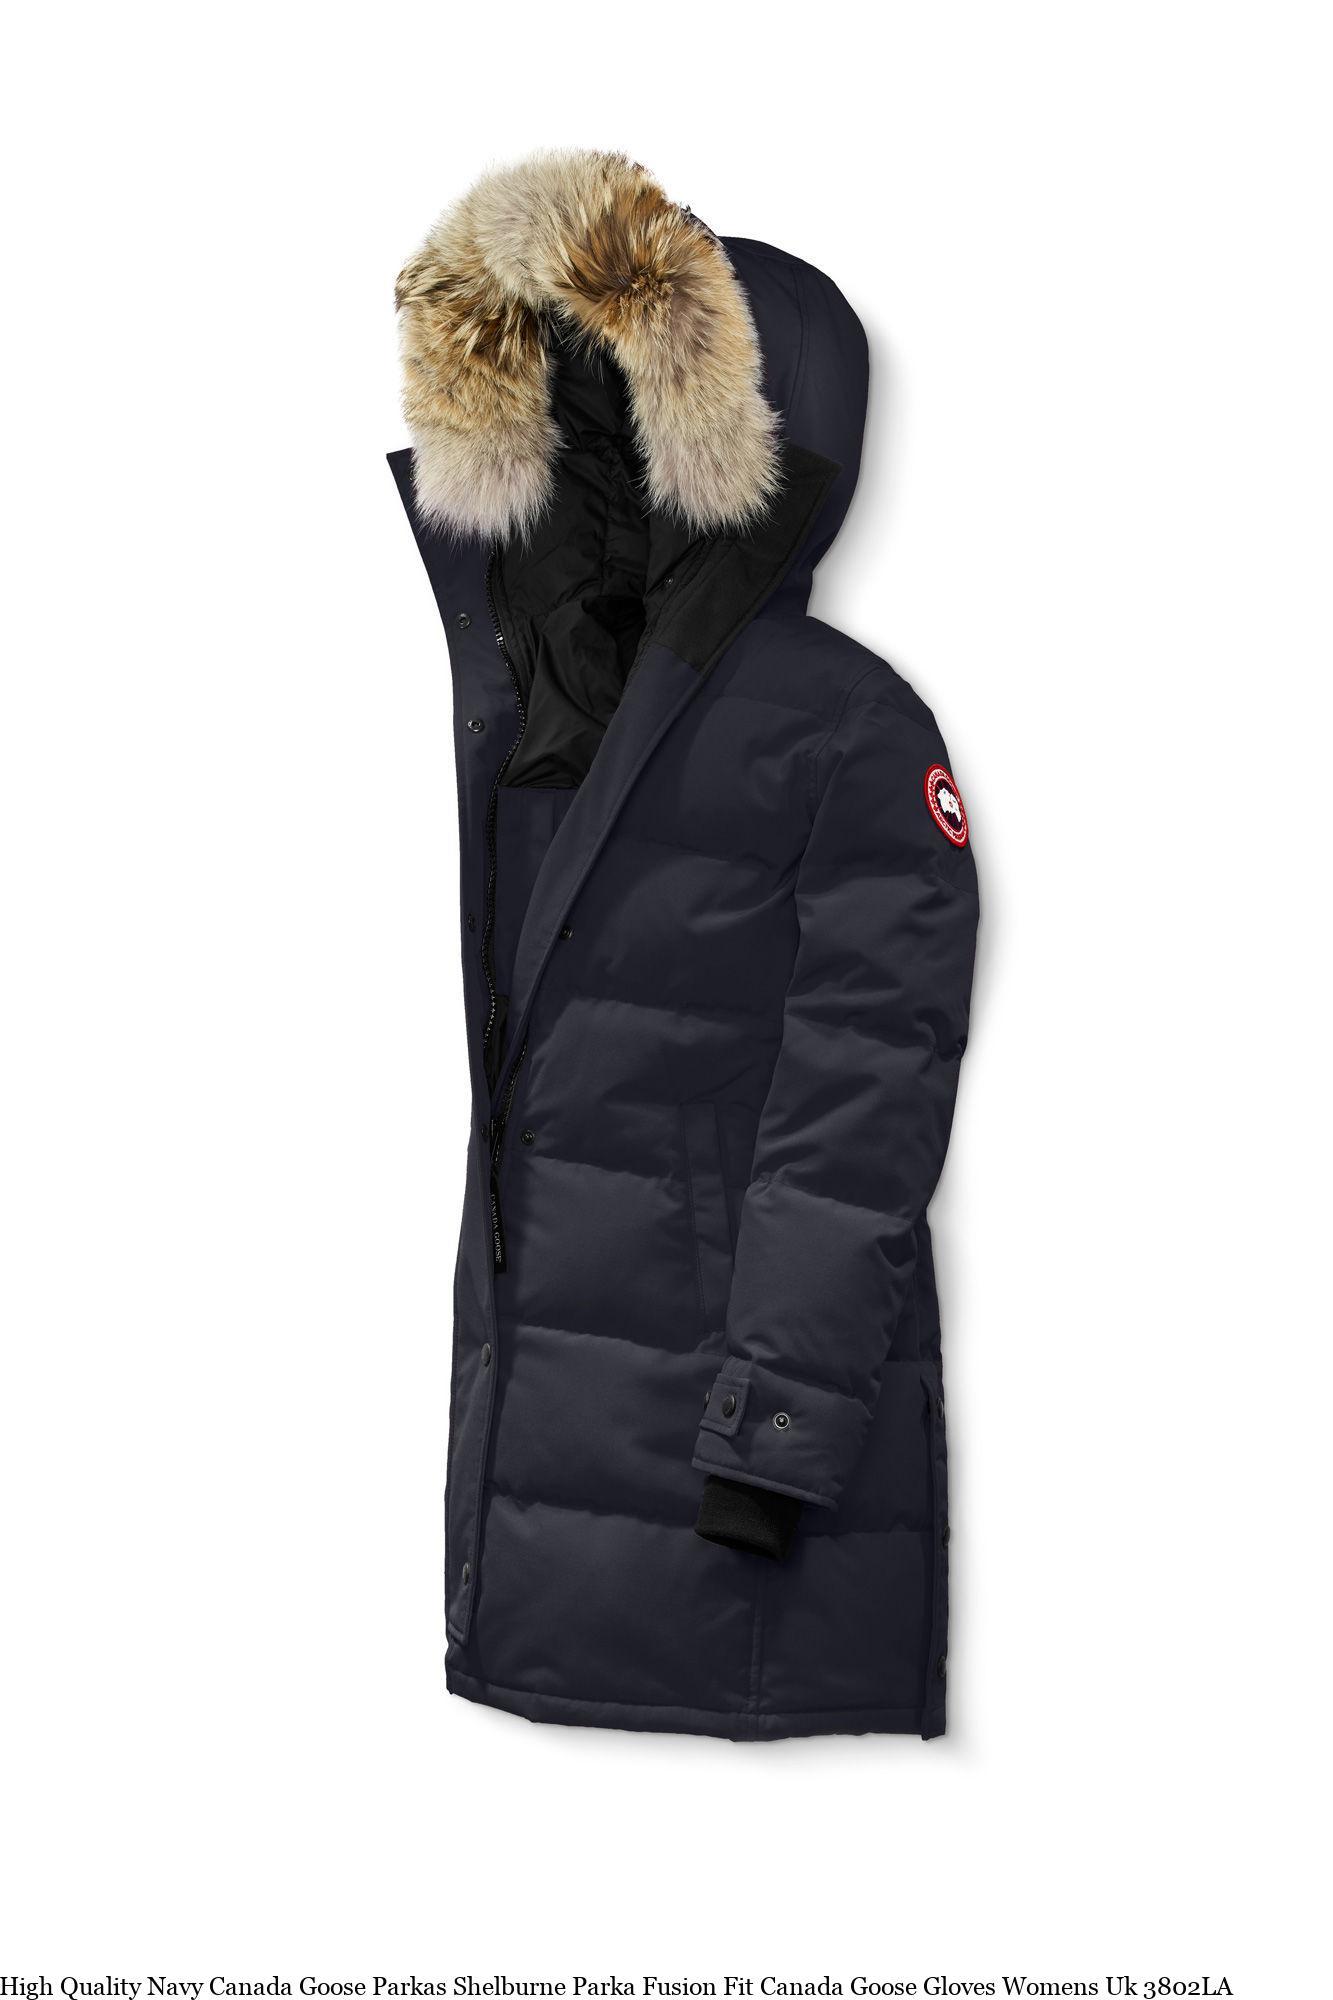 7e4a5c1b9b2 High Quality Navy Canada Goose Parkas Shelburne Parka Fusion Fit Canada  Goose Gloves Womens Uk 3802LA